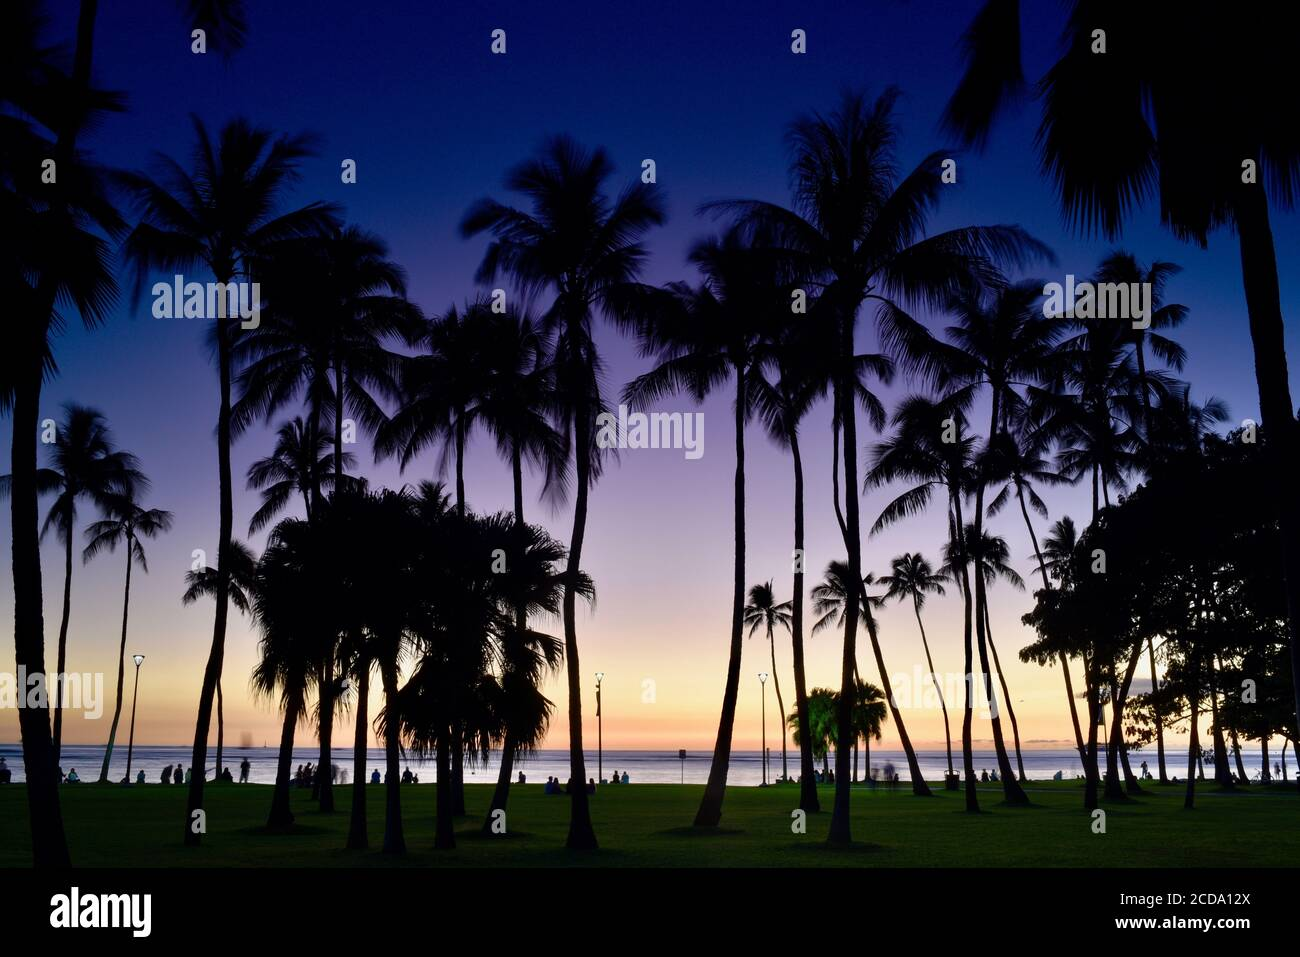 Spectacular and colorful sunset, silhouetted palm trees, on beach in resort neighborhood of Waikiki Beach, Oahu Island, Honolulu, Hawaii, USA Stock Photo